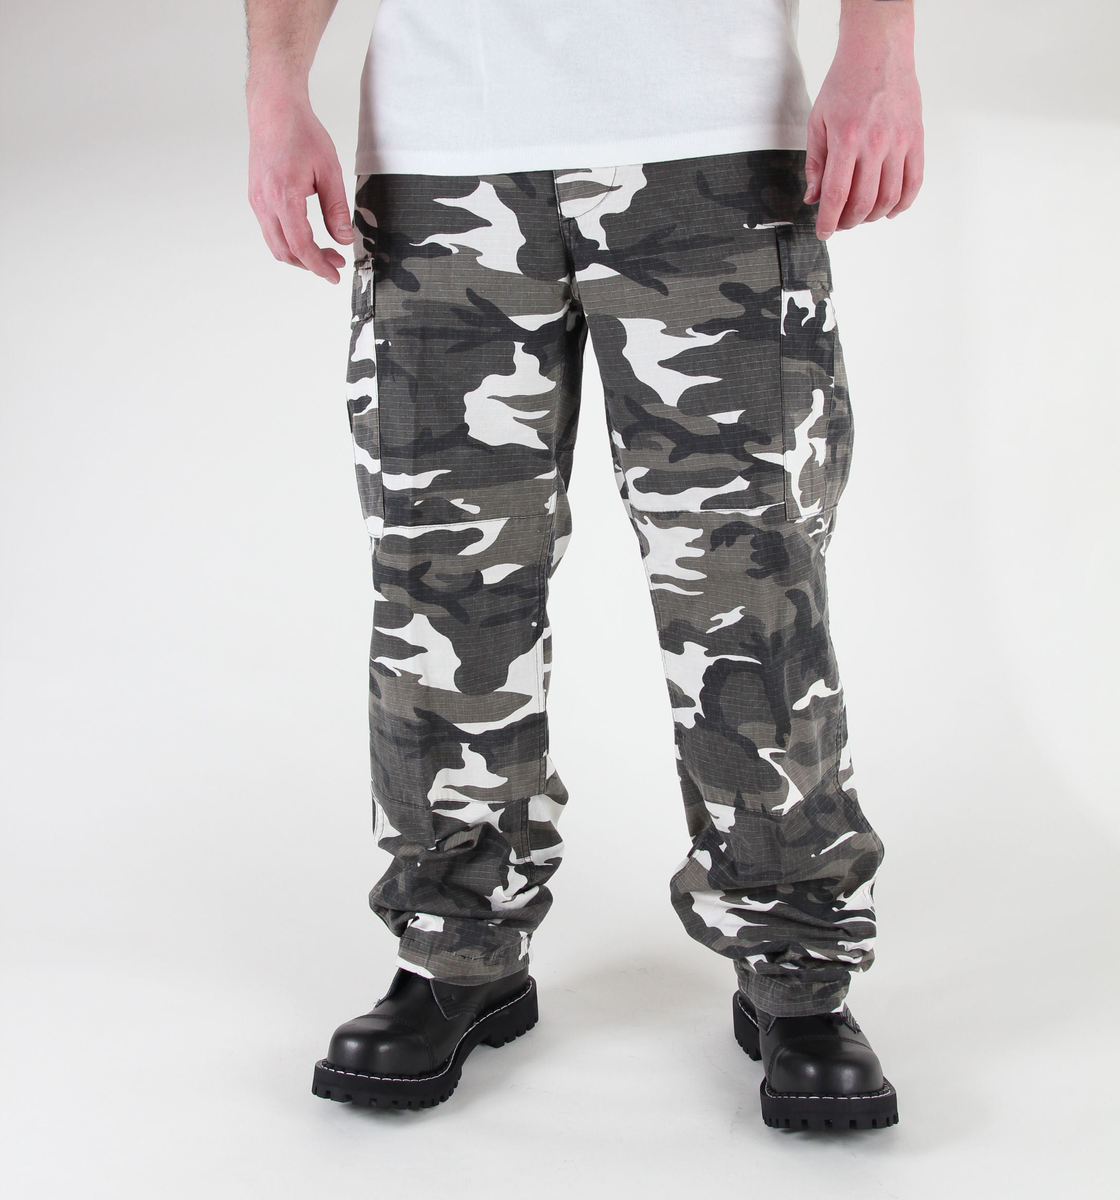 kalhoty pánské MIL-TEC - US Feldhose - CO Prewash Urban - 11825022